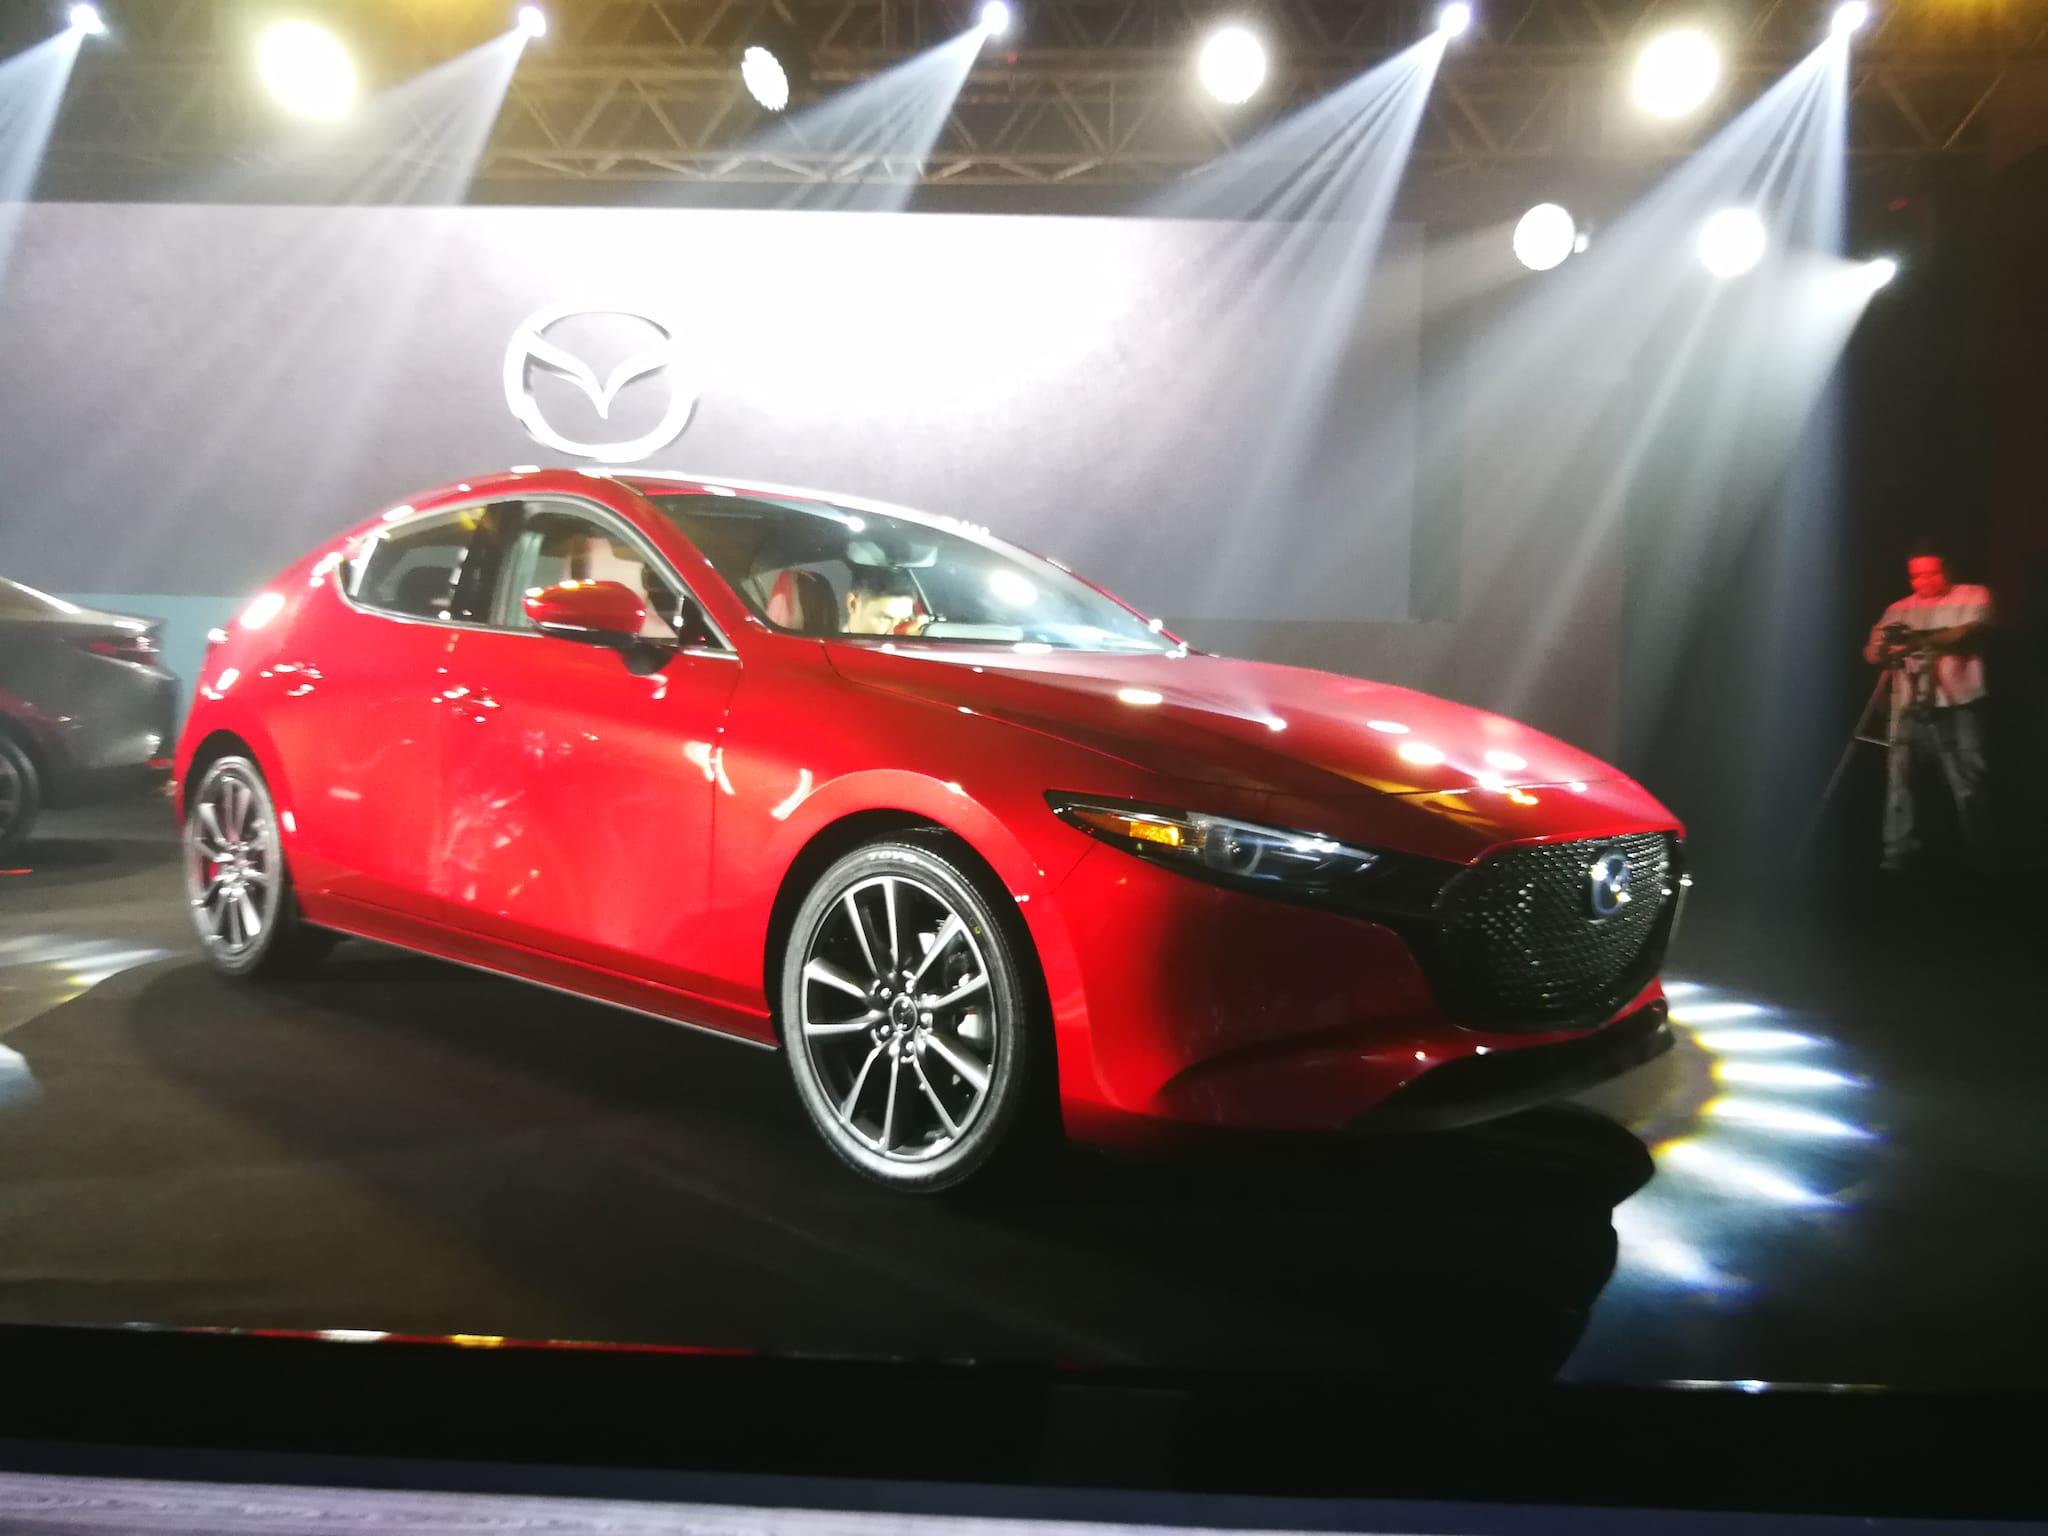 Mazda PH Gives Sneak Peek of All-New Mazda 3